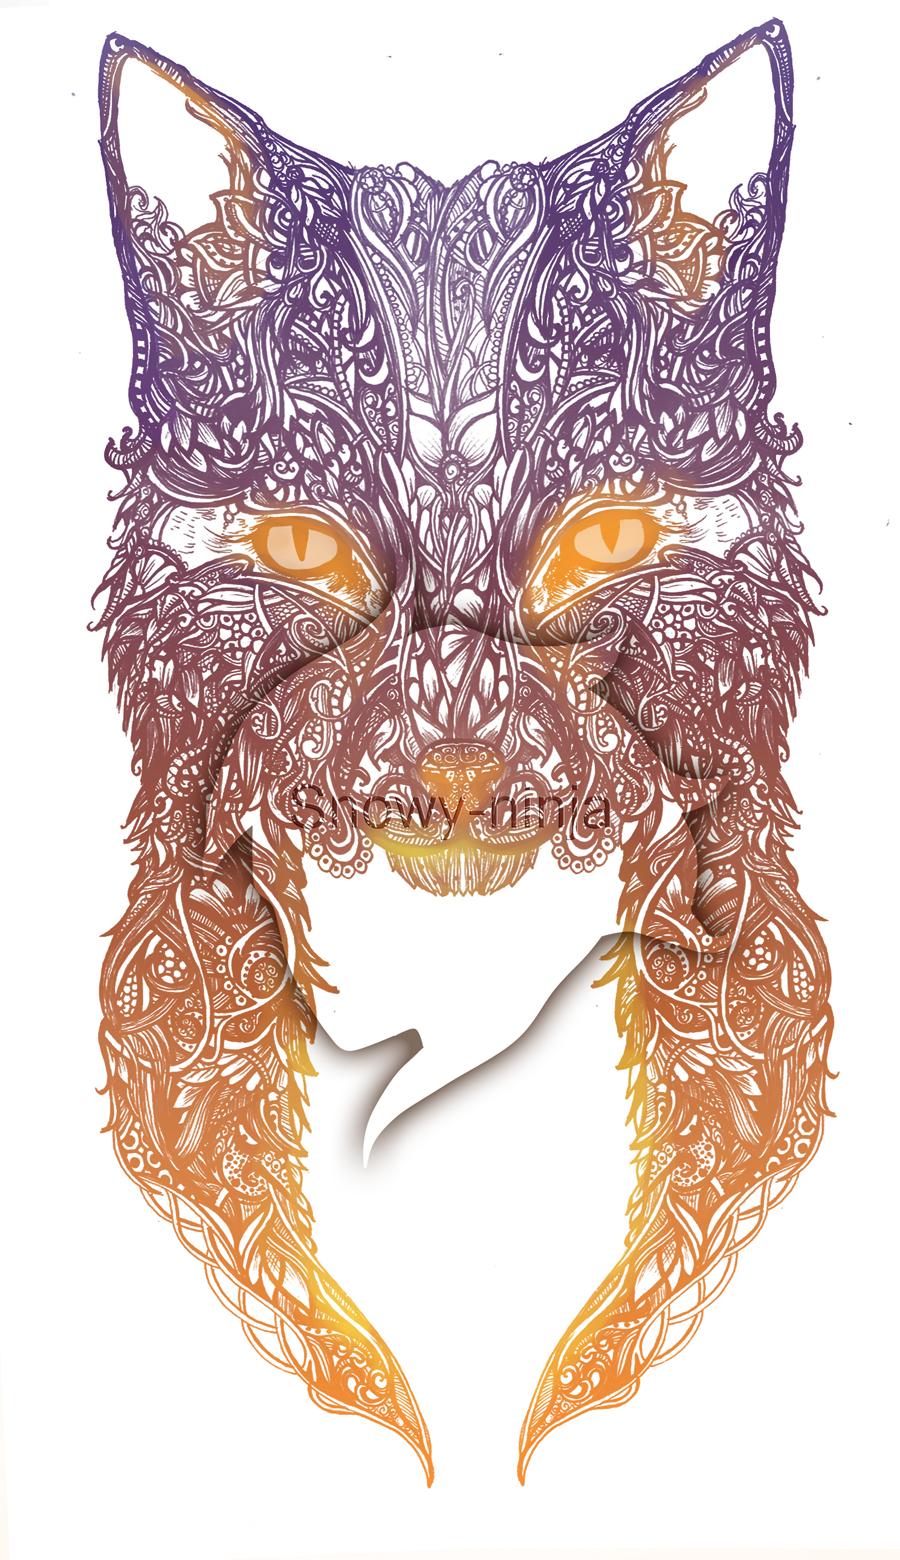 Red Fox by Snowy-Ninja